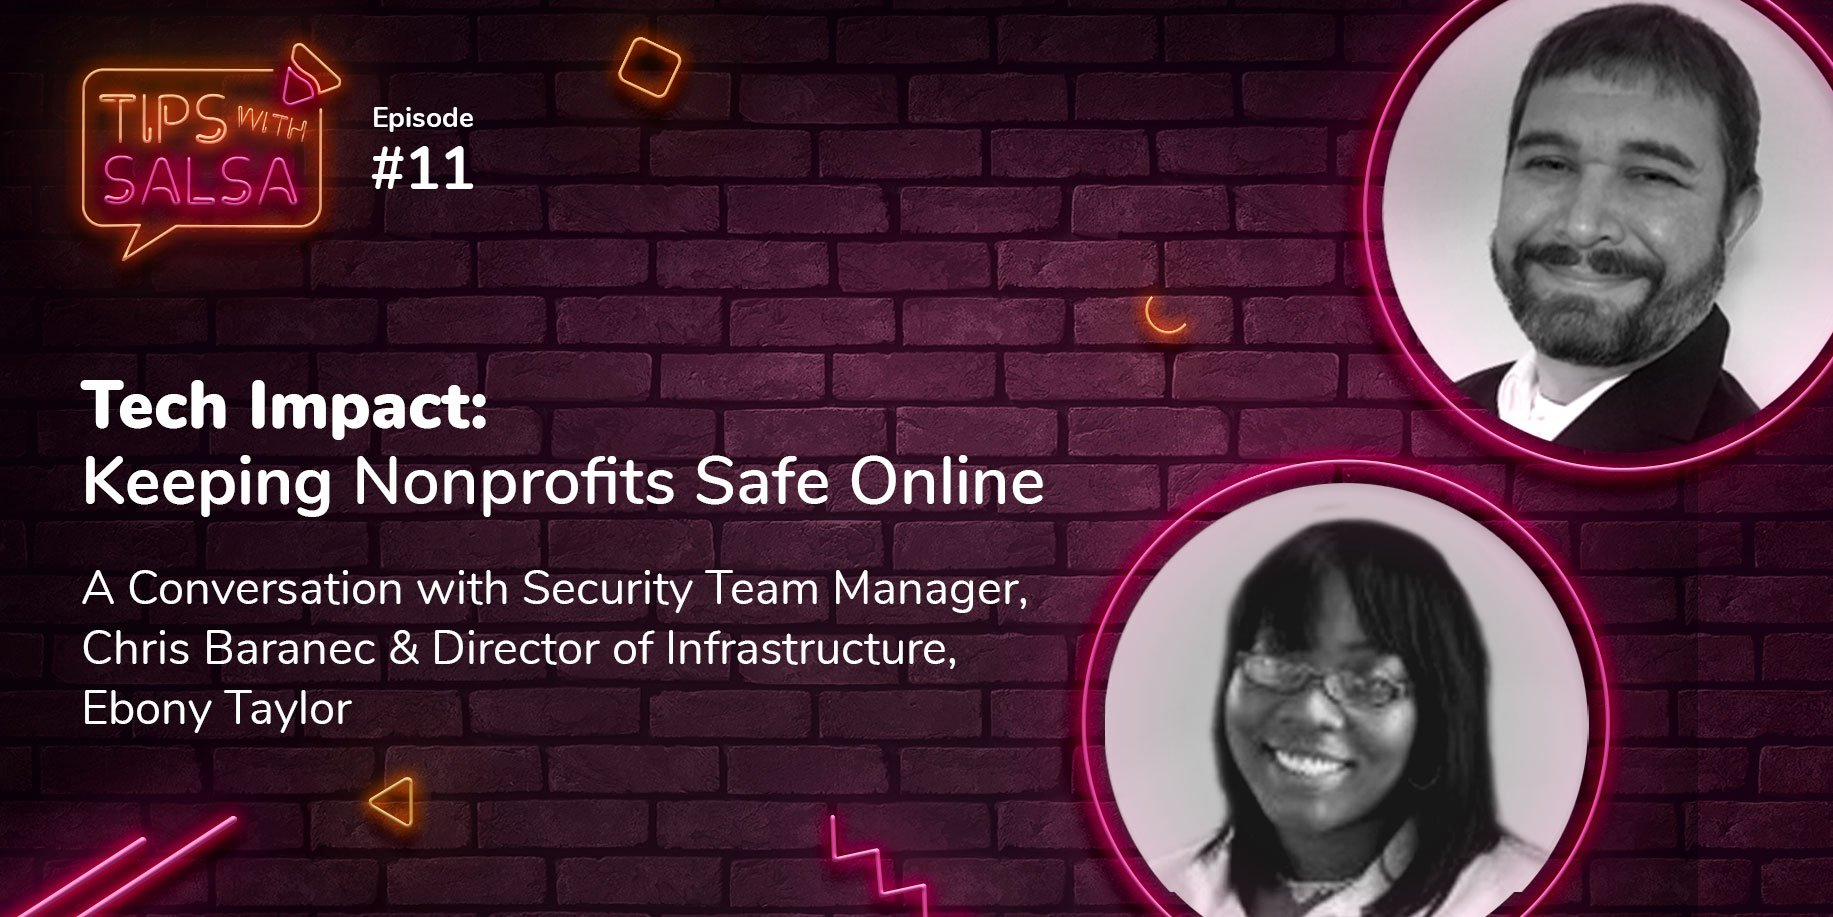 TECH IMPACT: Keeping Nonprofits Safe Online